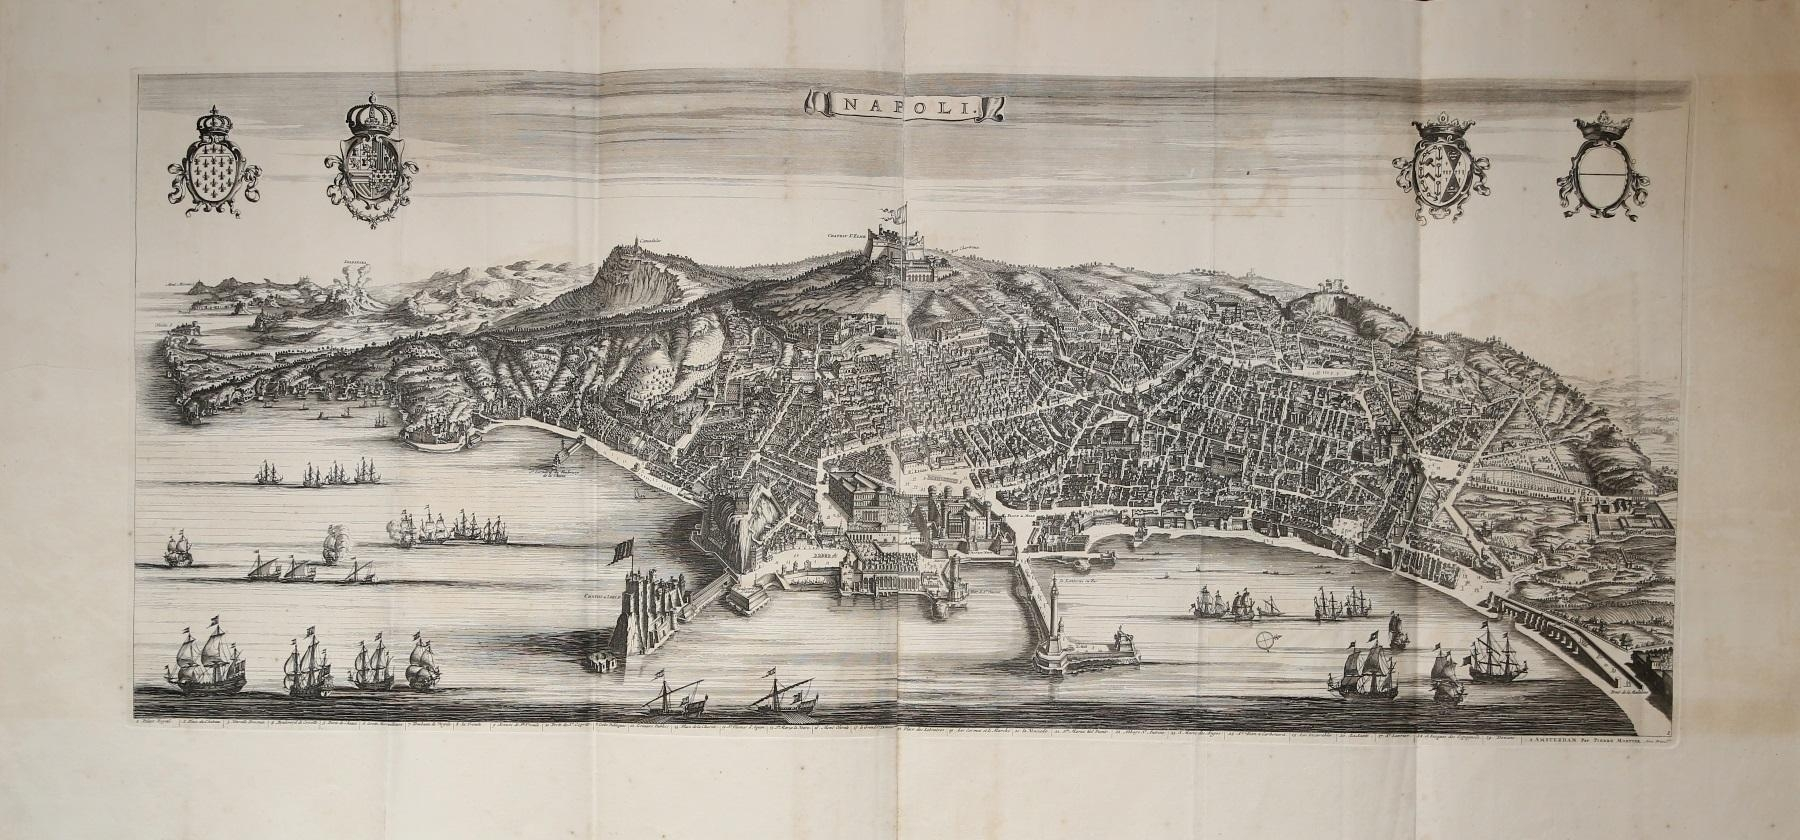 NAPOLI-Johannes-BLAEU-Editore-Amsterdam-1663